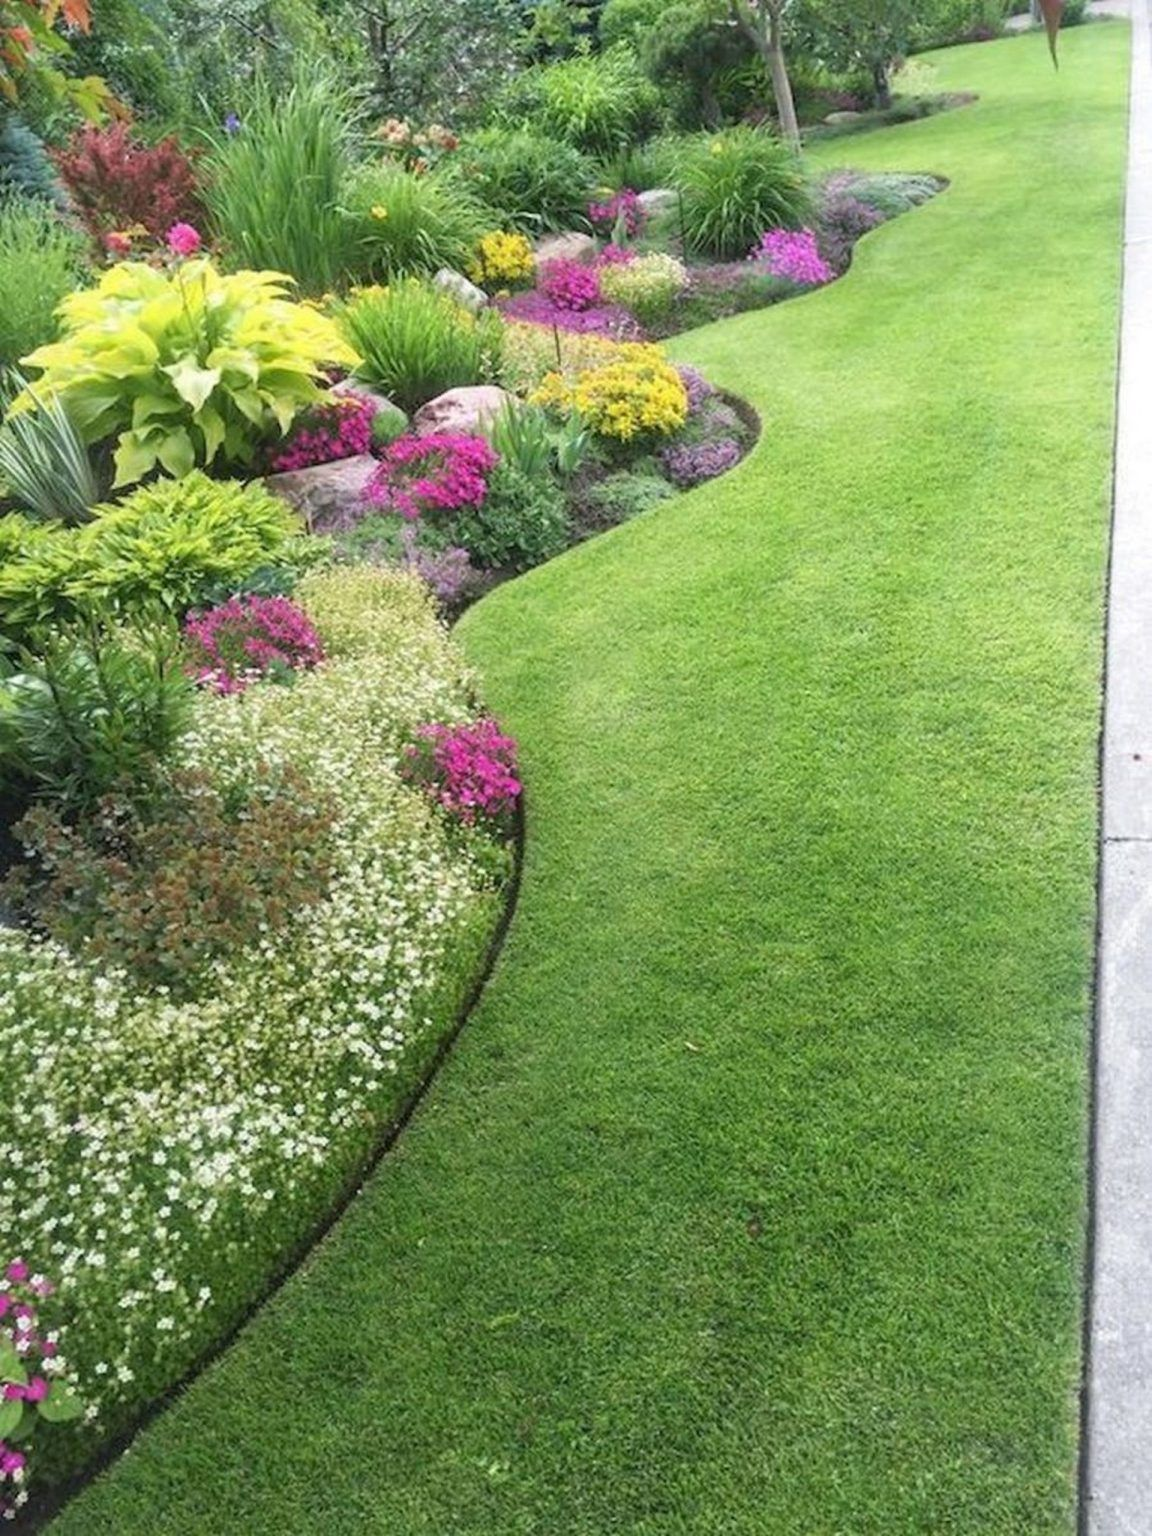 58 Beautiful Flower Garden Design Ideas House Of Gallery In 2020 Small Yard Landscaping Garden Design Backyard Landscaping